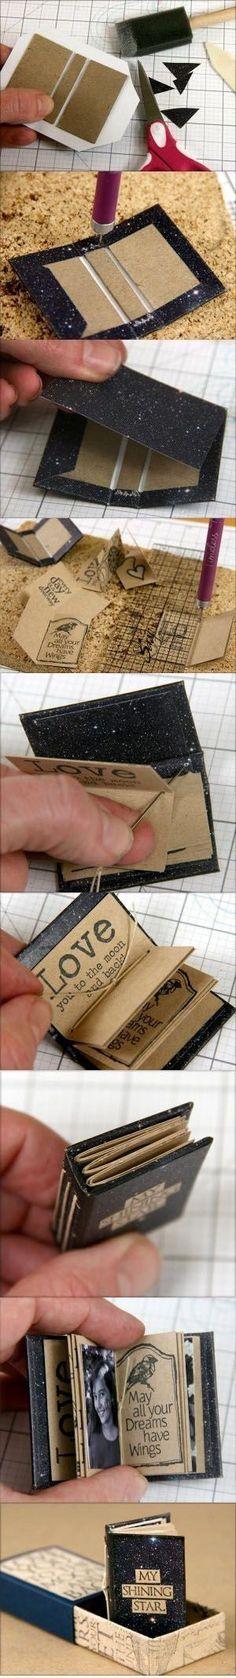 Book binding tutorial diy mini albums new Ideas Fun Crafts, Diy And Crafts, Arts And Crafts, Mini Albums, Diy Paper, Paper Crafts, Mini Album Tutorial, Ideias Diy, Handmade Books